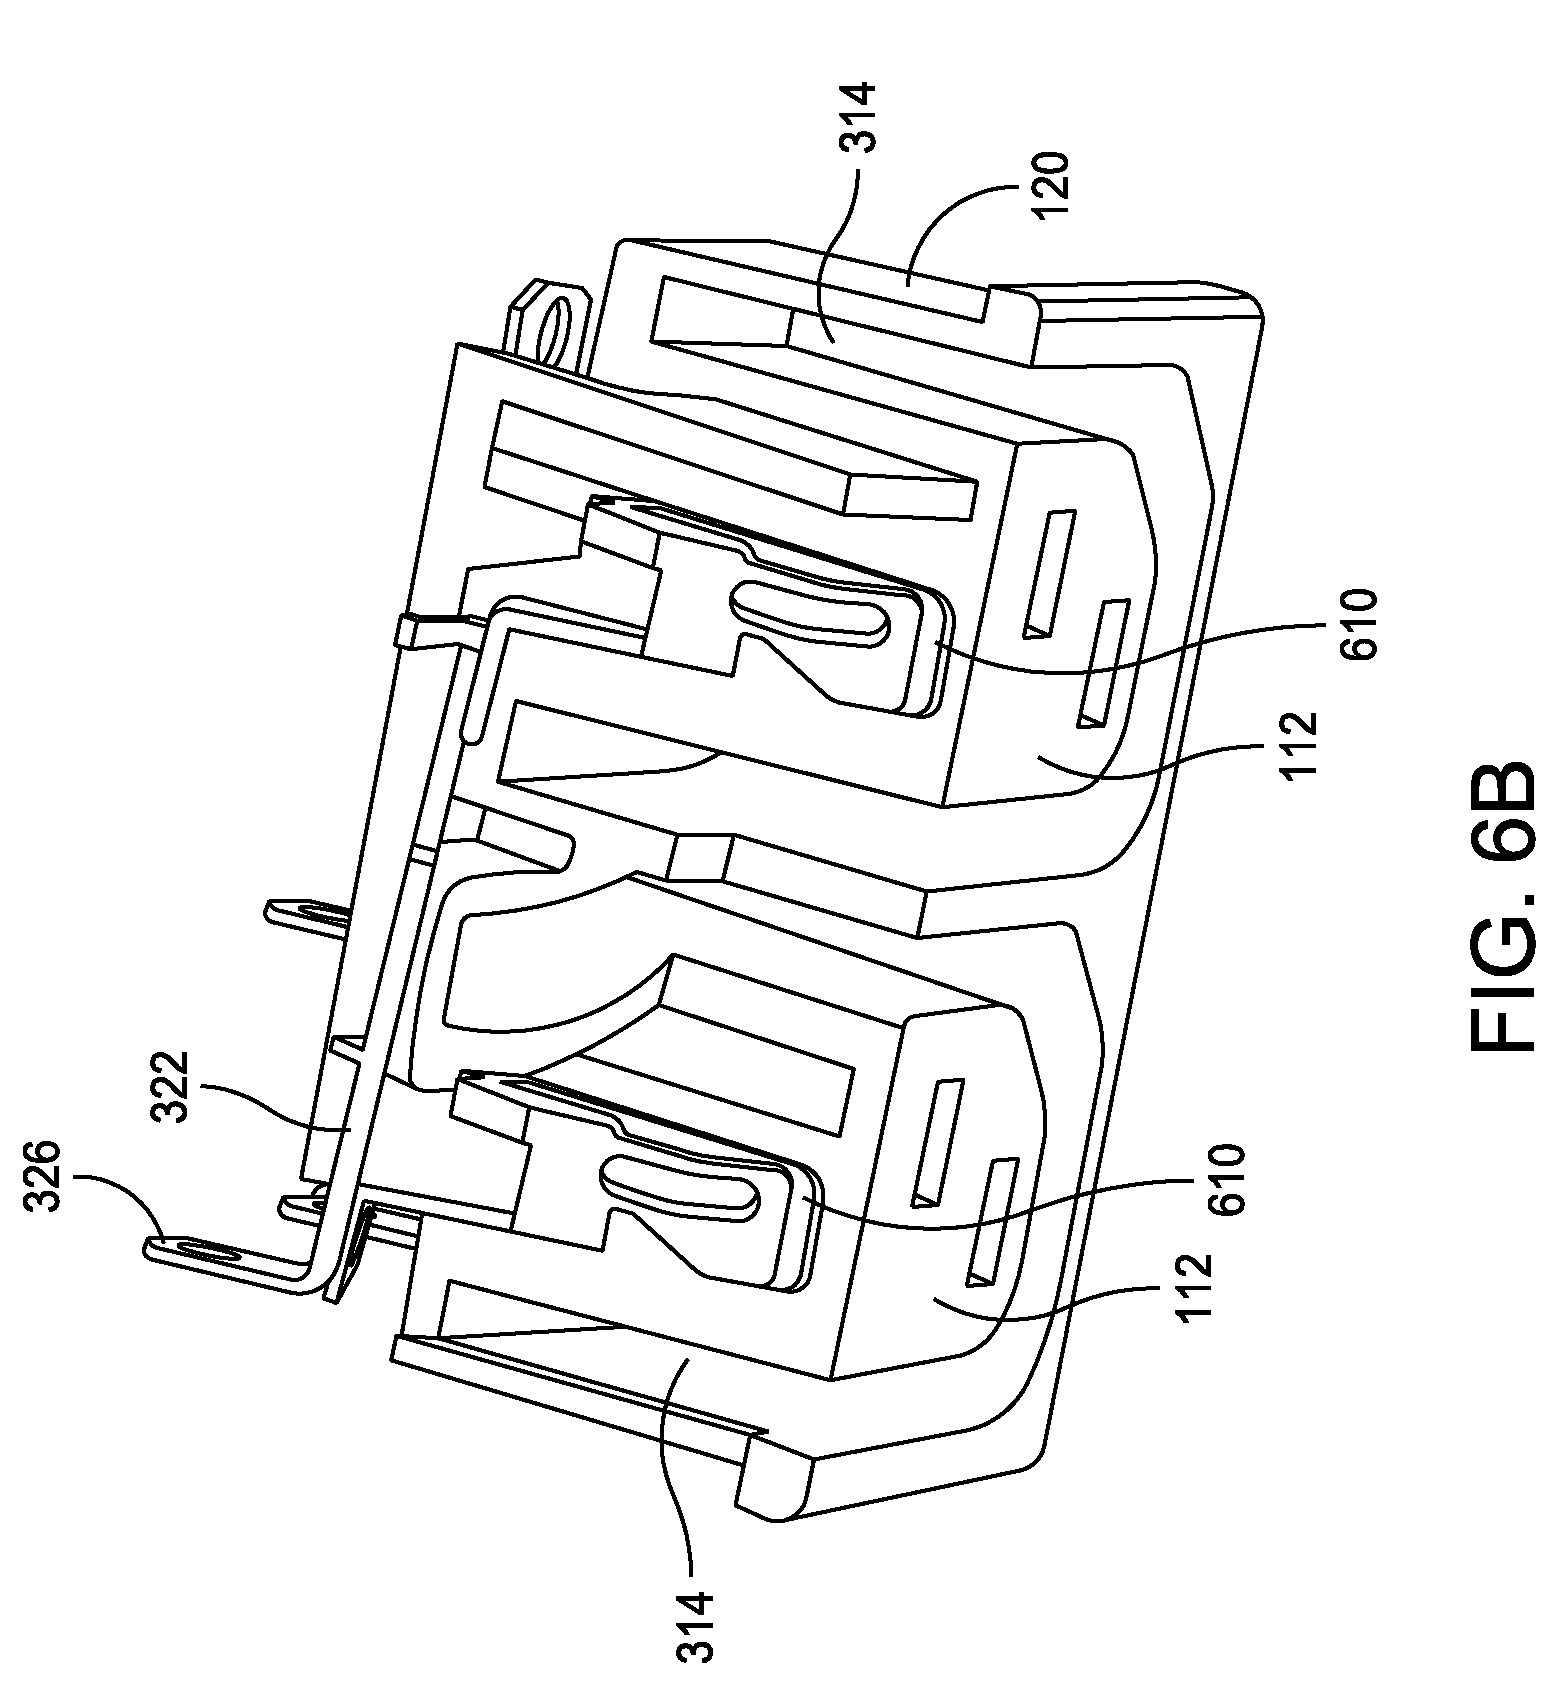 patente us8052437